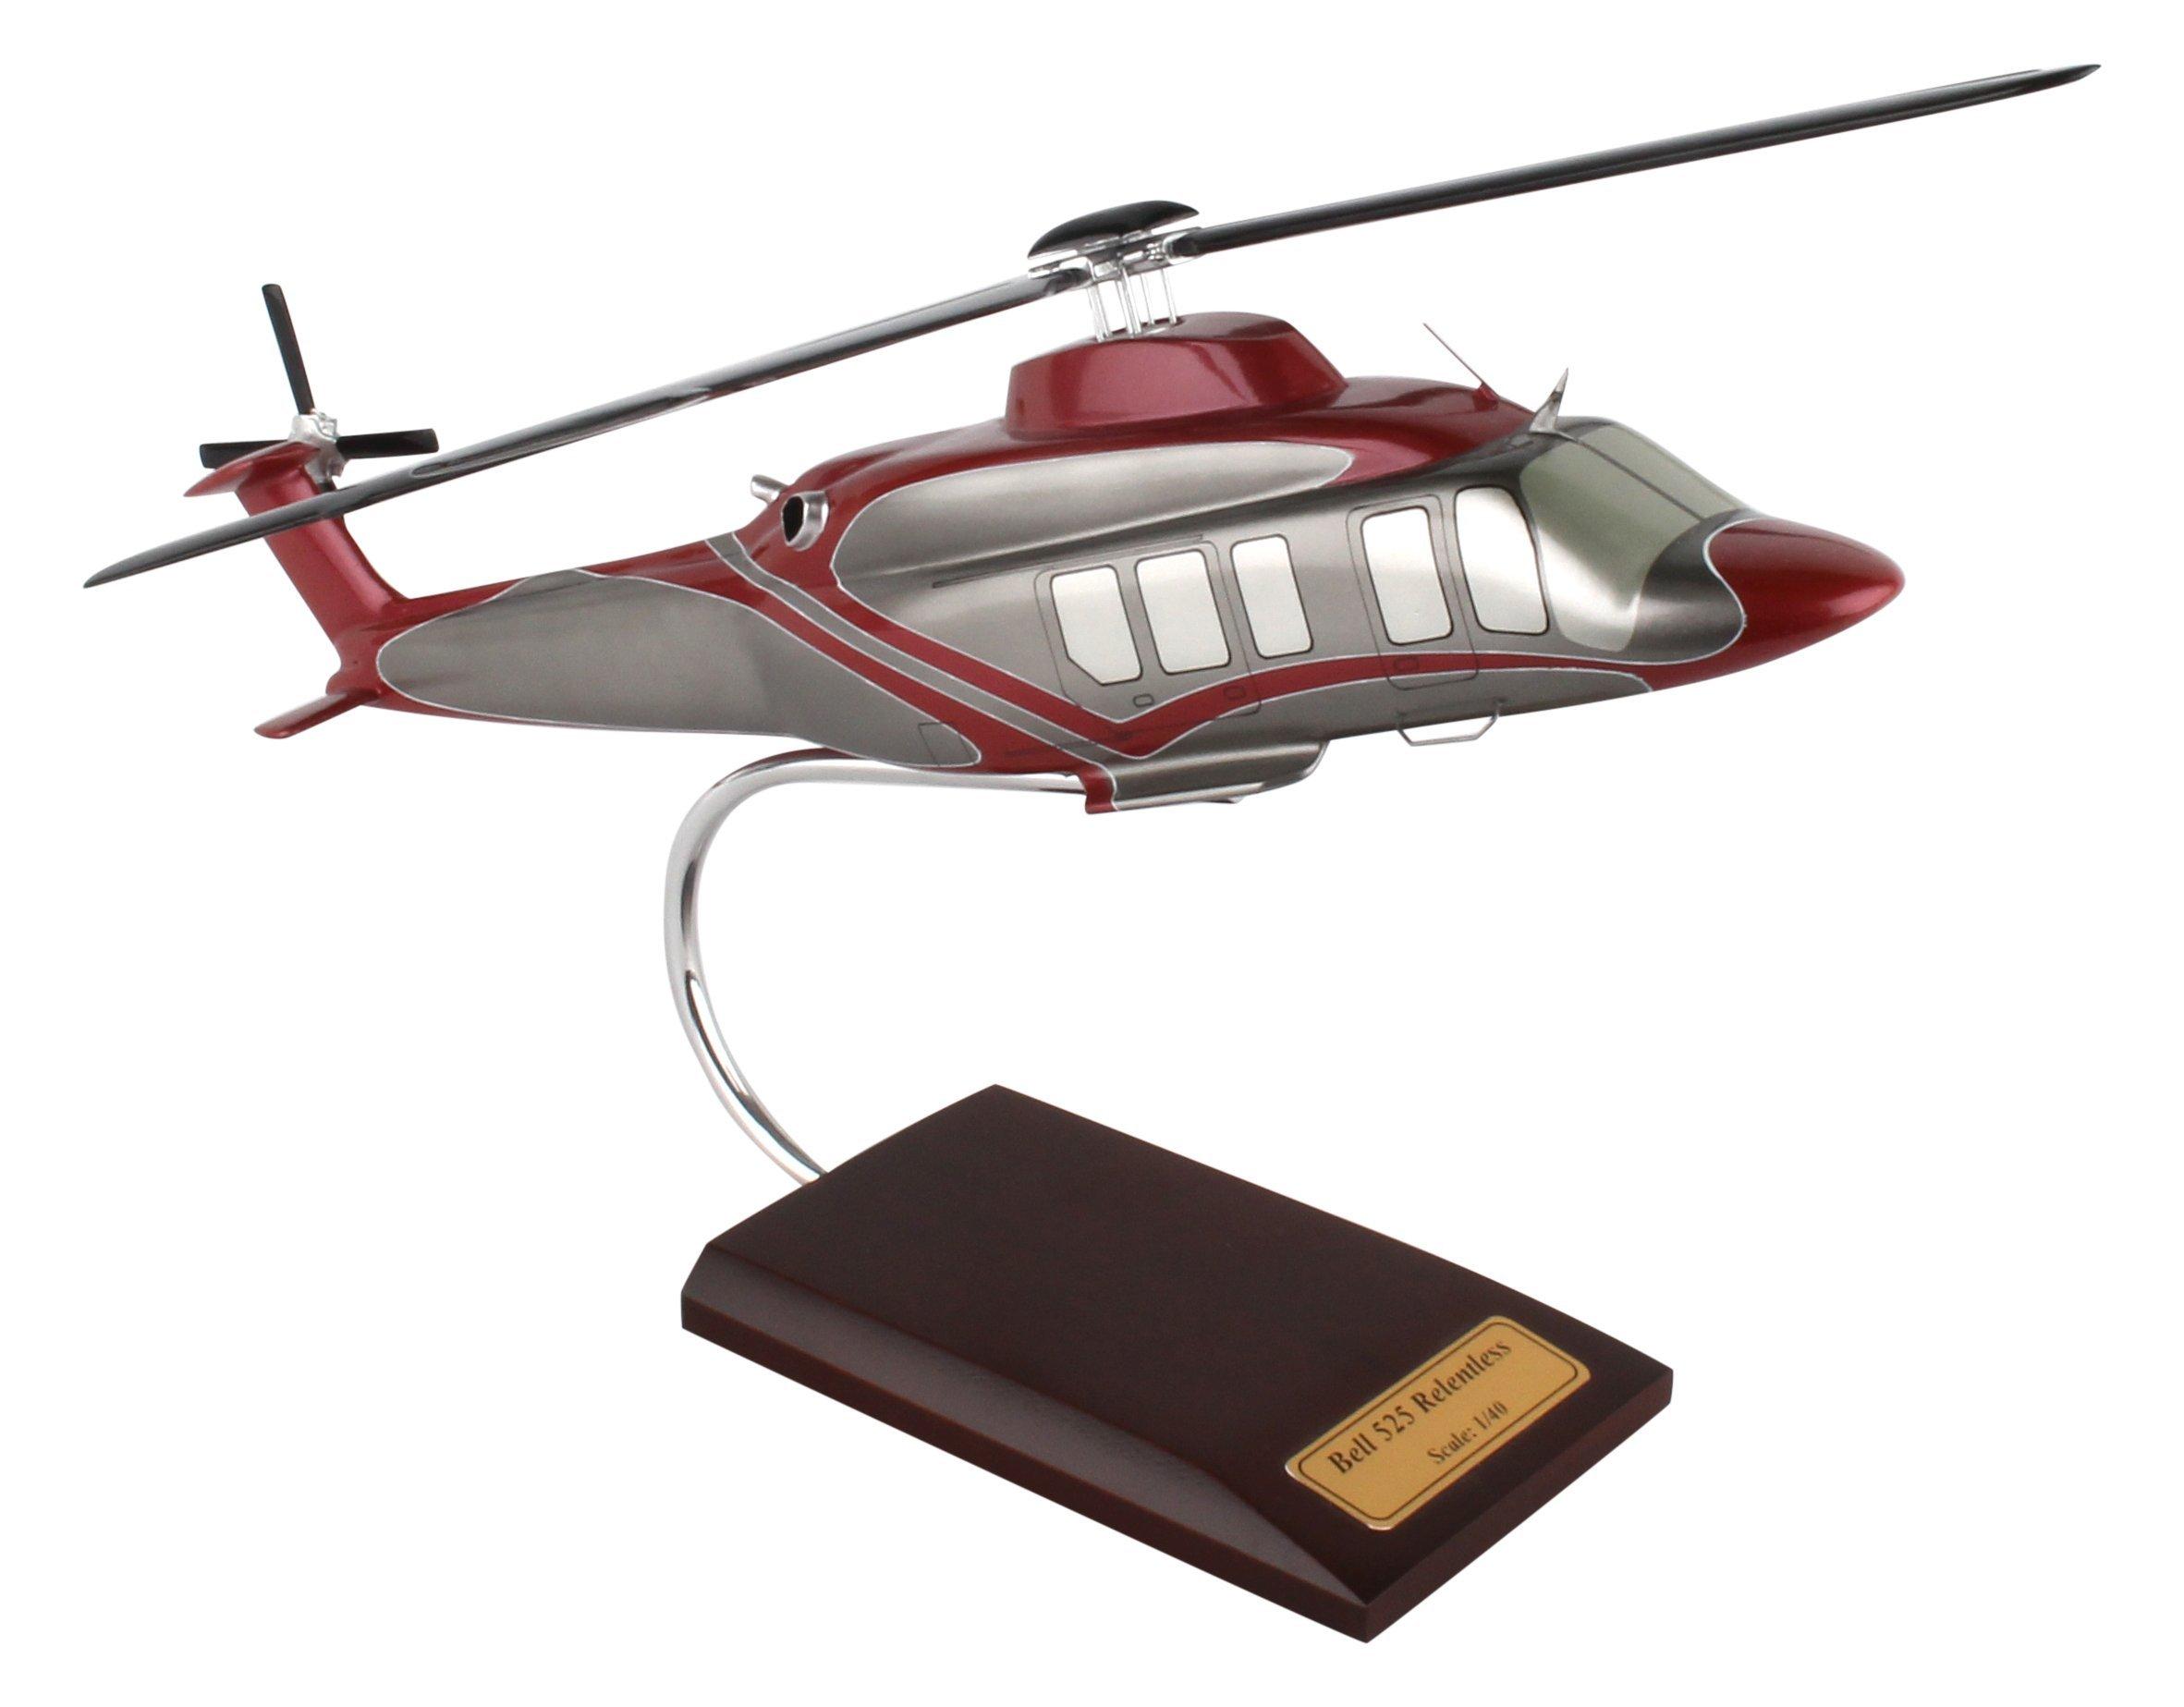 Executive Series Models Bell 525 Relentless Helicopter (1/40 Scale) by Executive Series Models